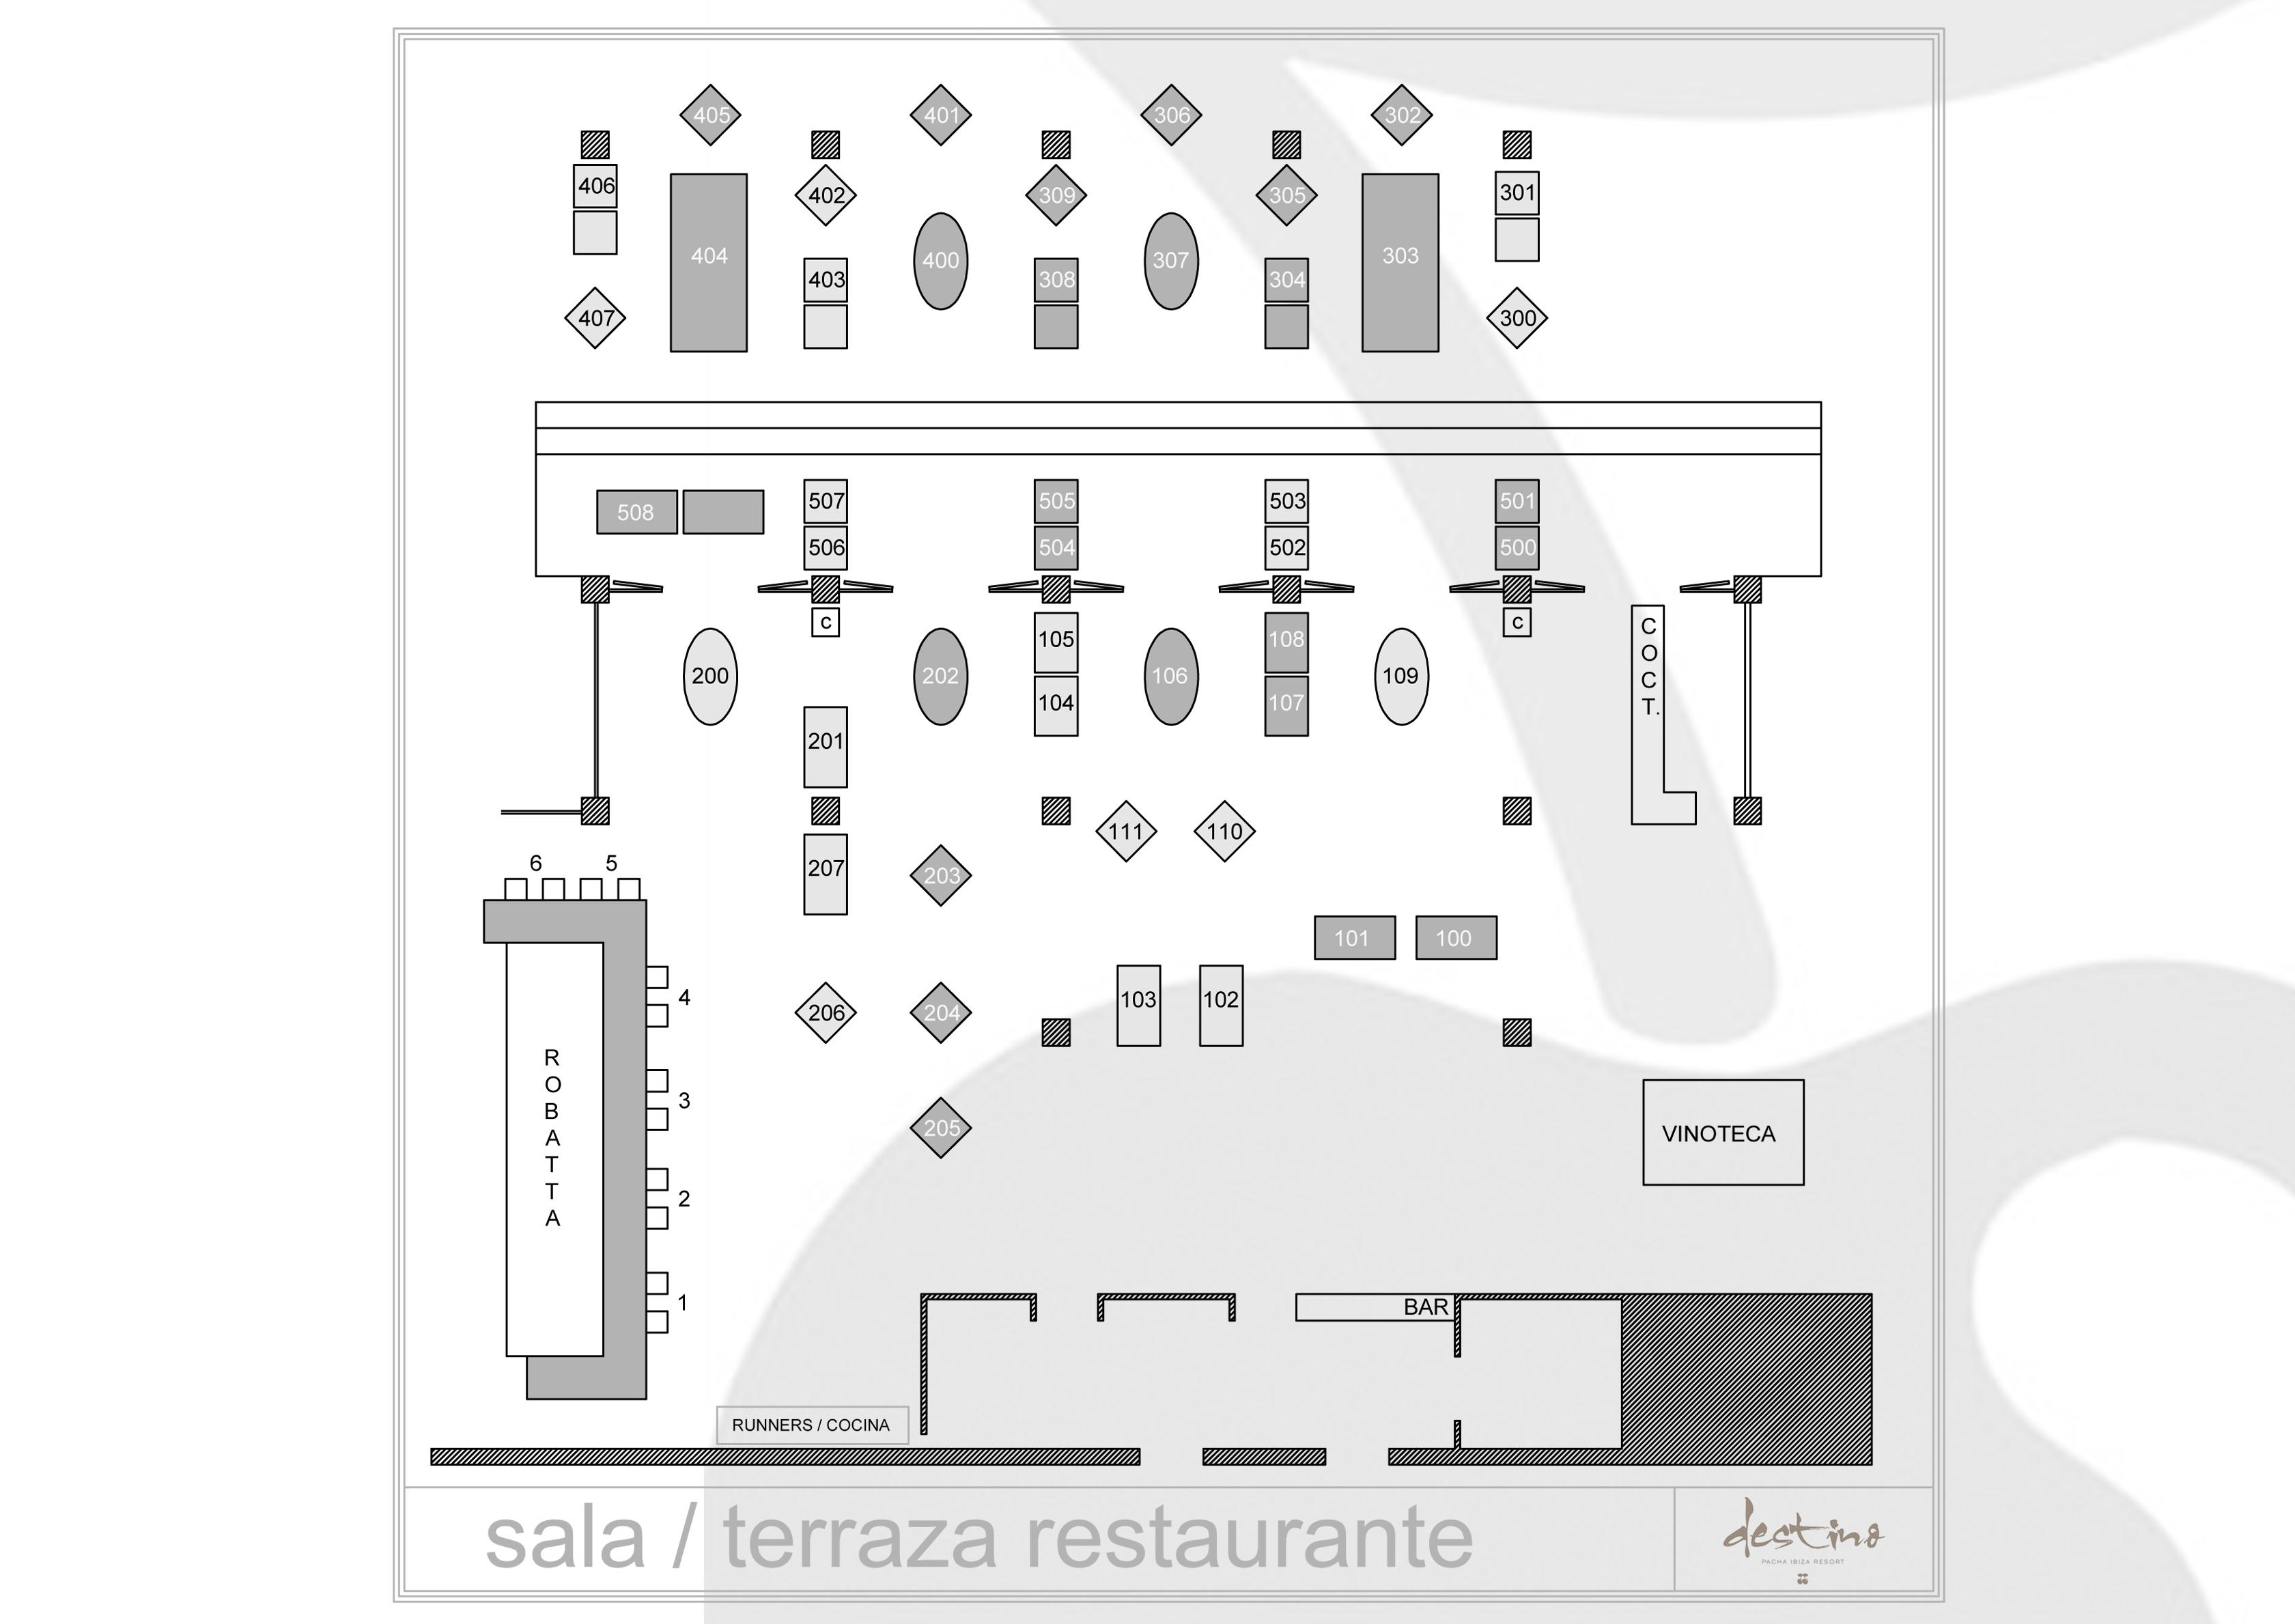 Ricard Fabregat Marn  Infoarchitecture  Interior Design